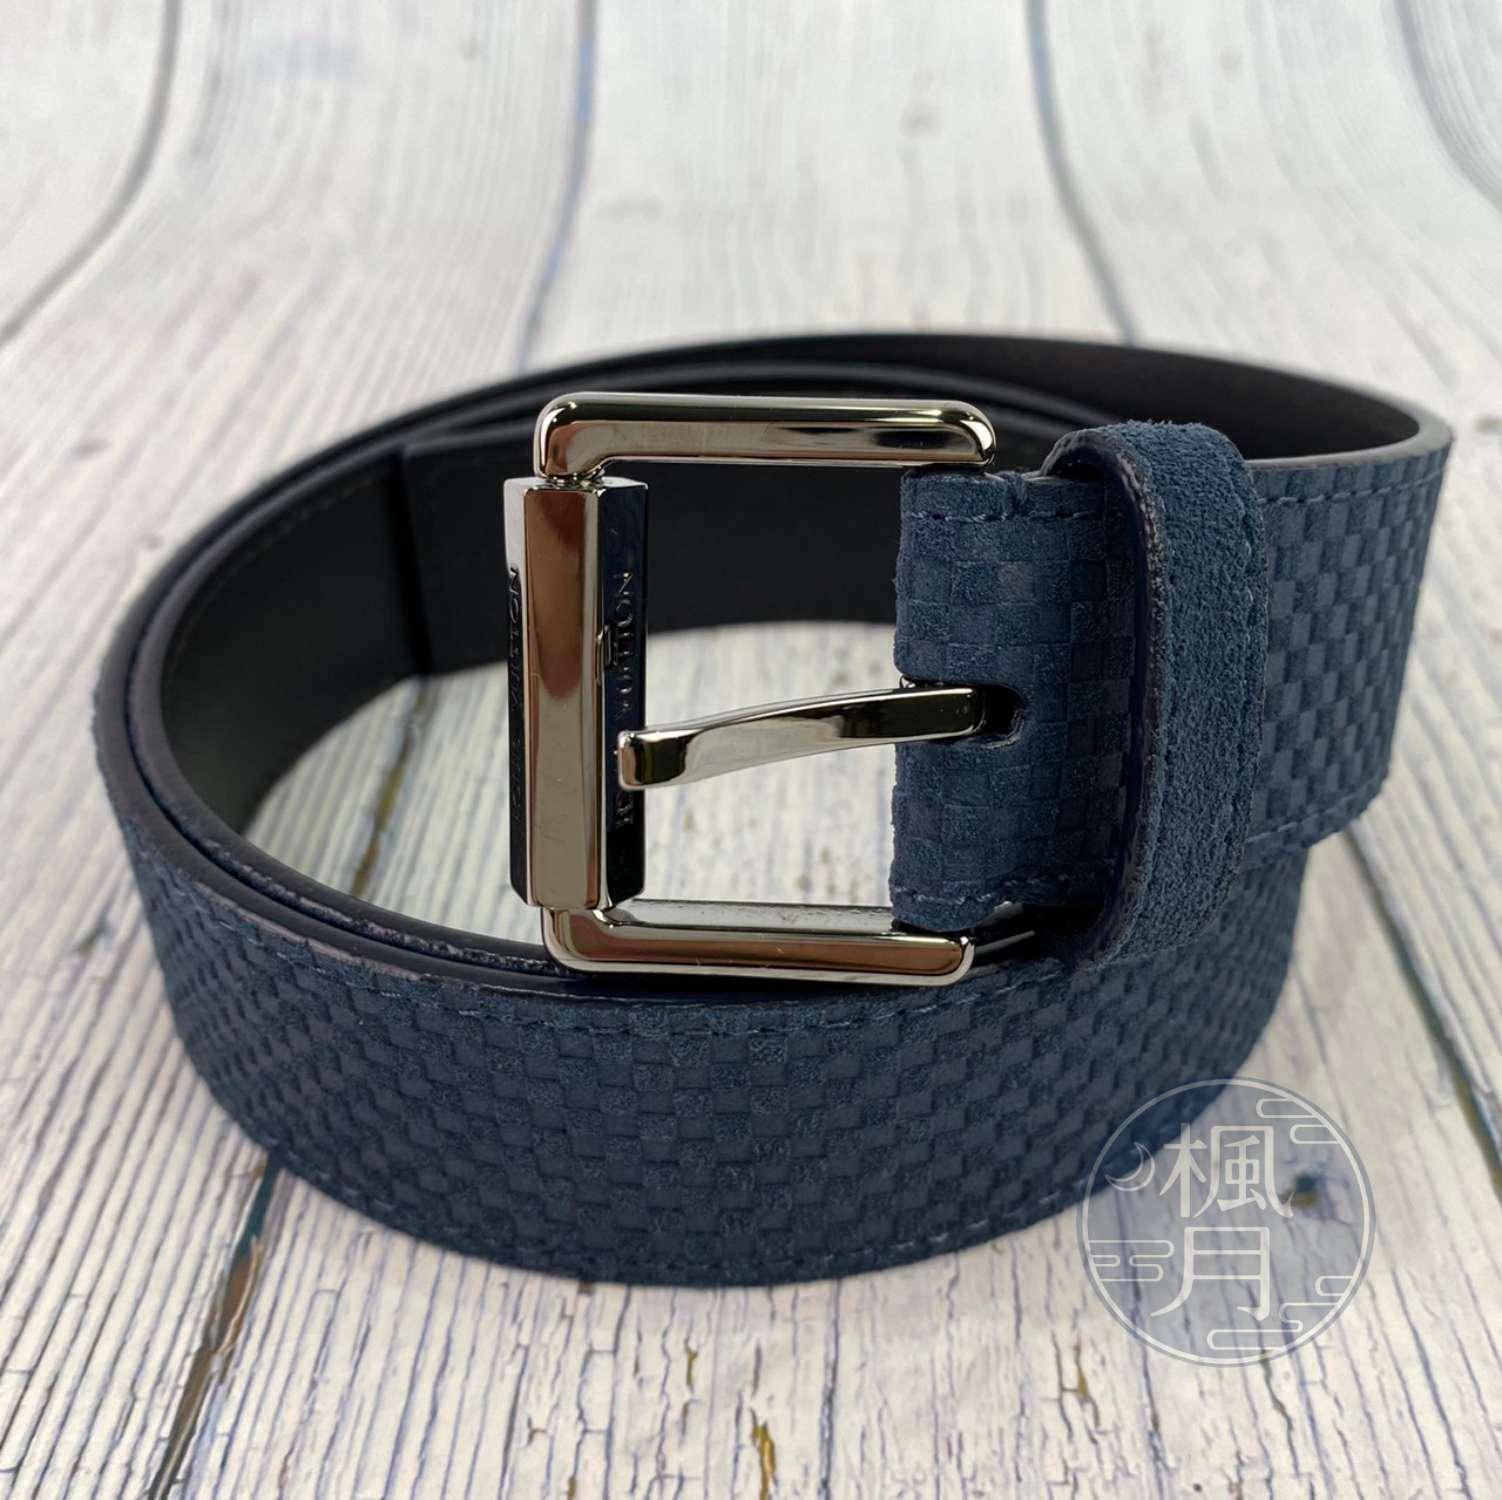 BRAND楓月 LOUIS VUITTON LV 路易威登 M9539 深藍色 小格紋 銀釦 皮帶 #90 腰帶 配件